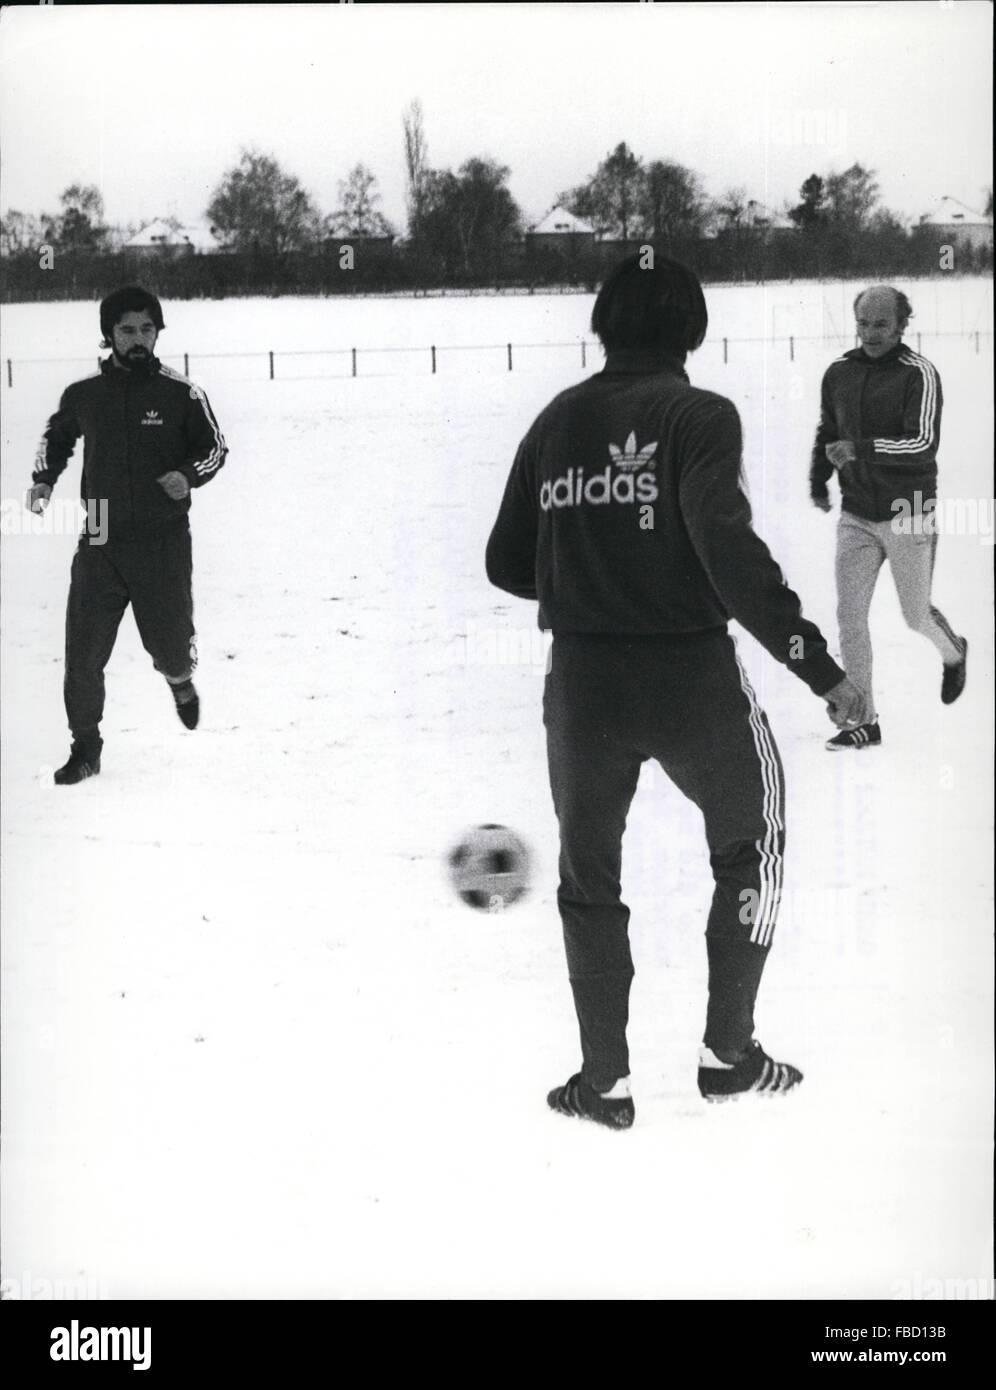 1962 - Gerd Muller on the Field Again : After two months of illness, soccerstar Gerd Muller from '' Bayern Munchen Stock Photo